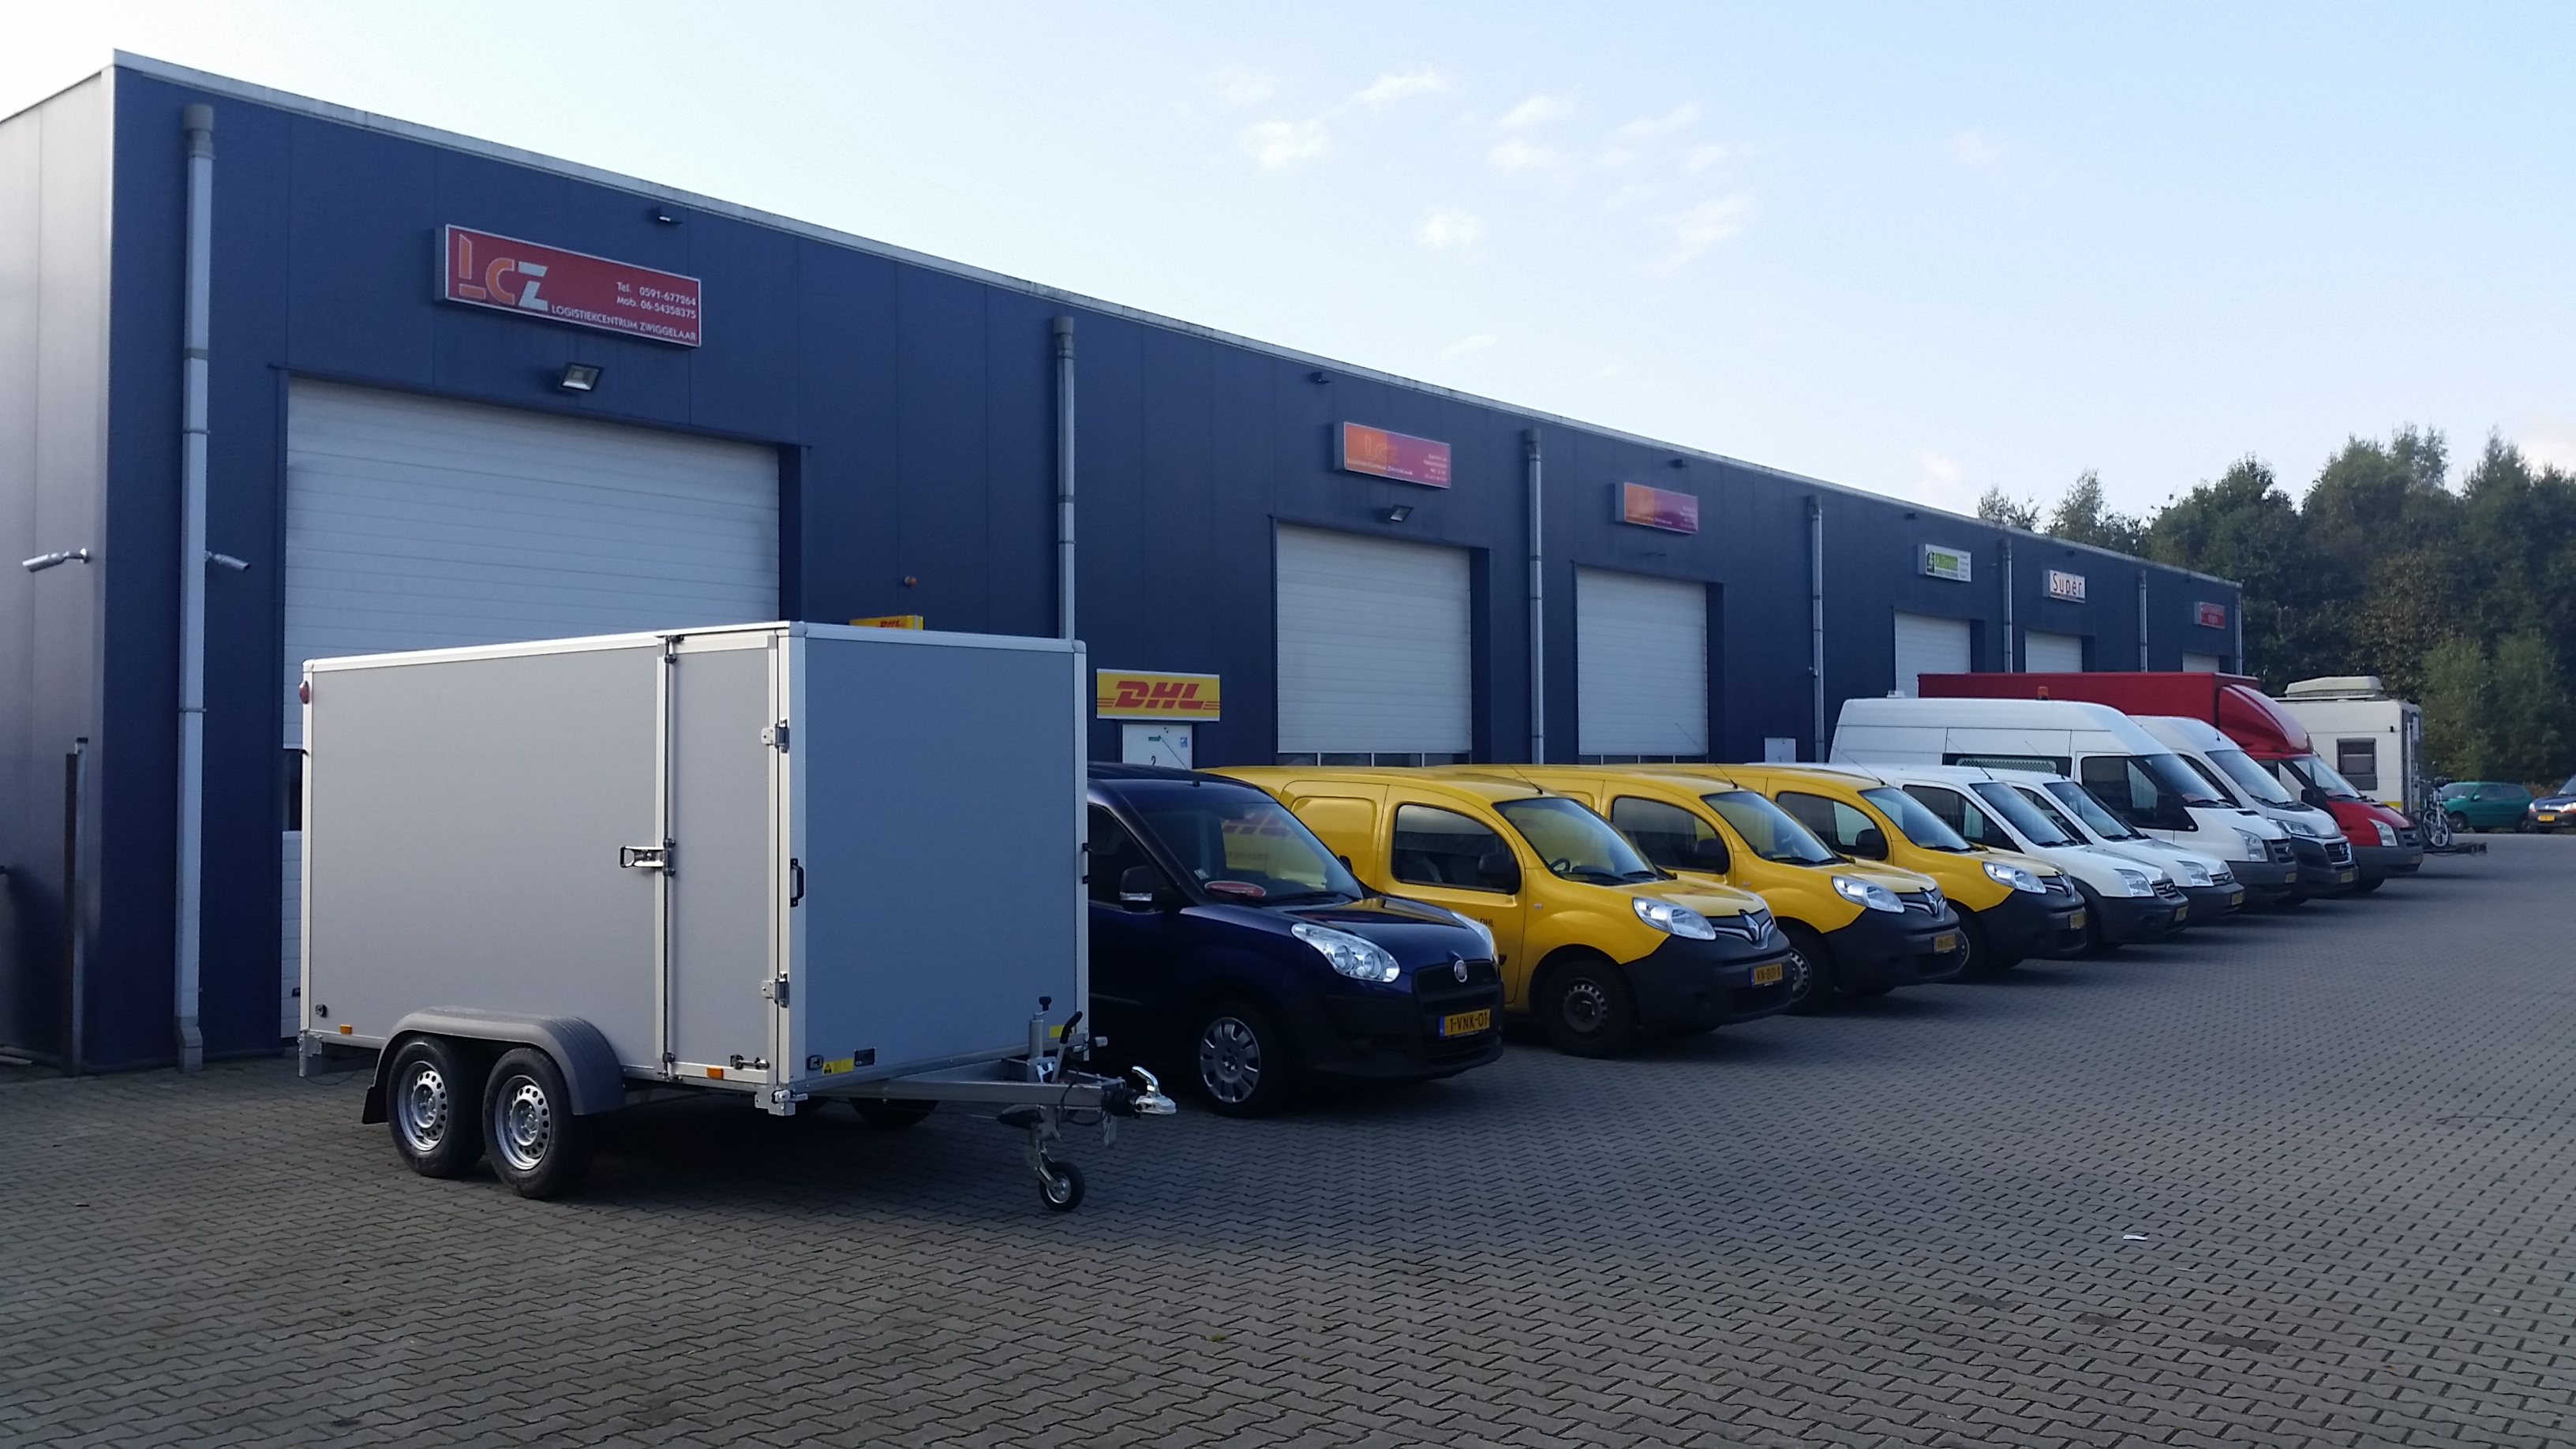 http://logistiekcentrumzwiggelaar.nl/wp-content/uploads/2016/10/logistiek-centrum-zwiggelaar-8.jpg